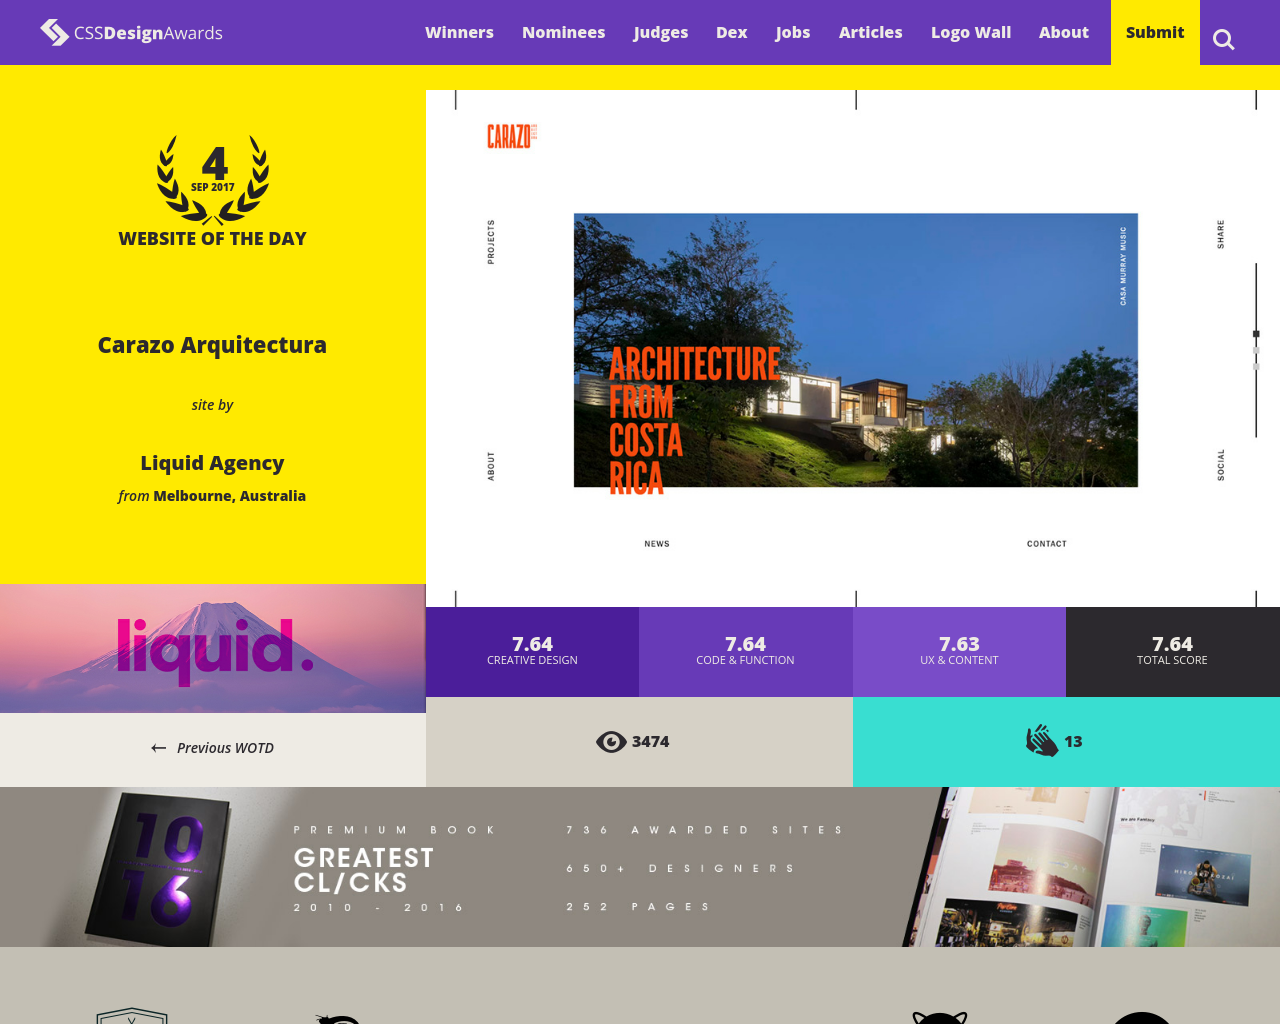 CSS-Design-Awards-Advertising-Reviews-Pricing